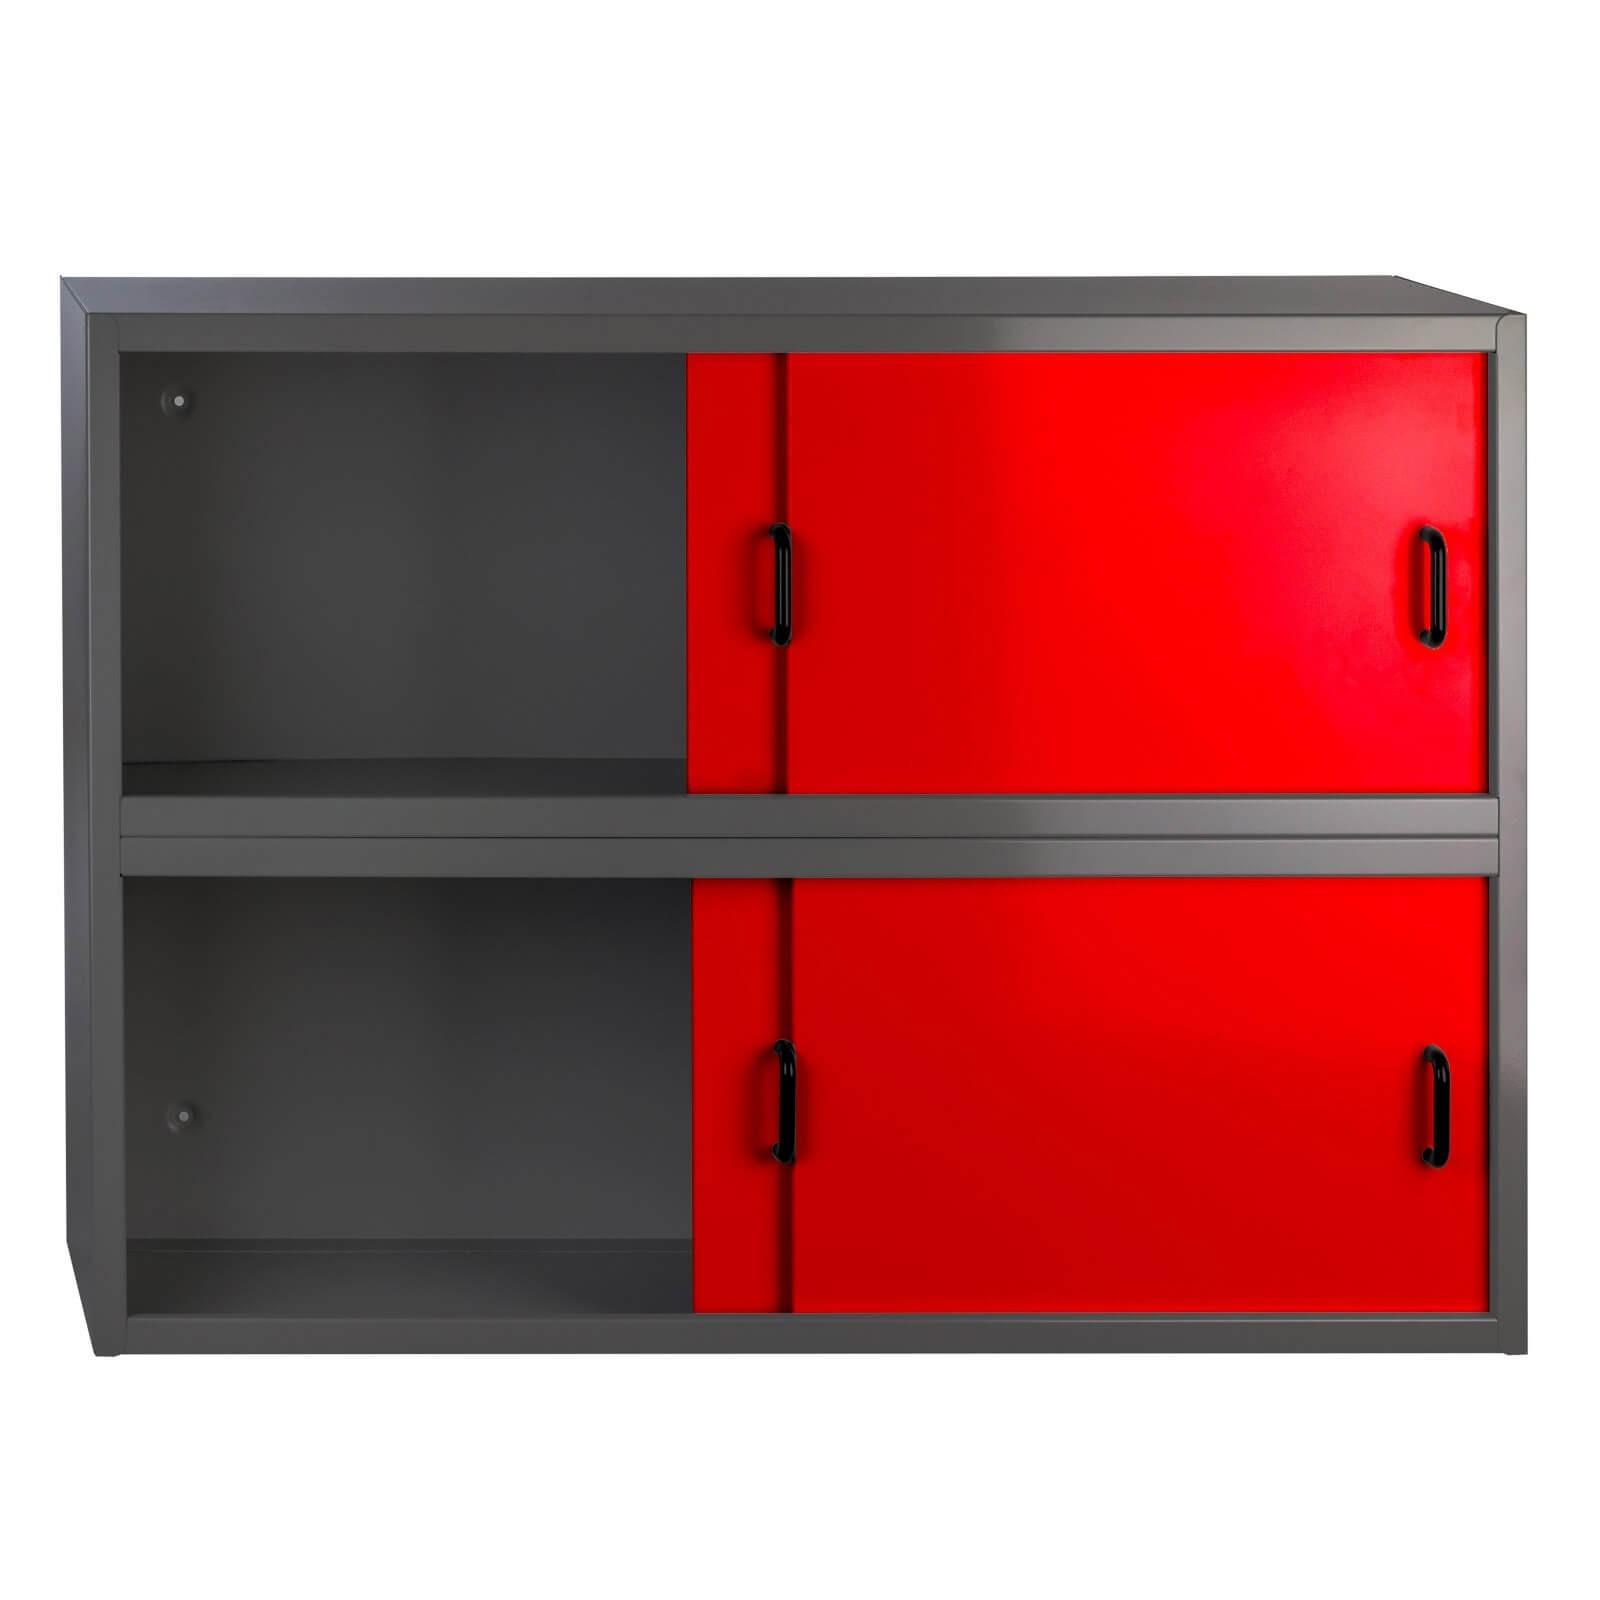 h ngeschrank wandschrank werkstattschrank metallschrank 4. Black Bedroom Furniture Sets. Home Design Ideas